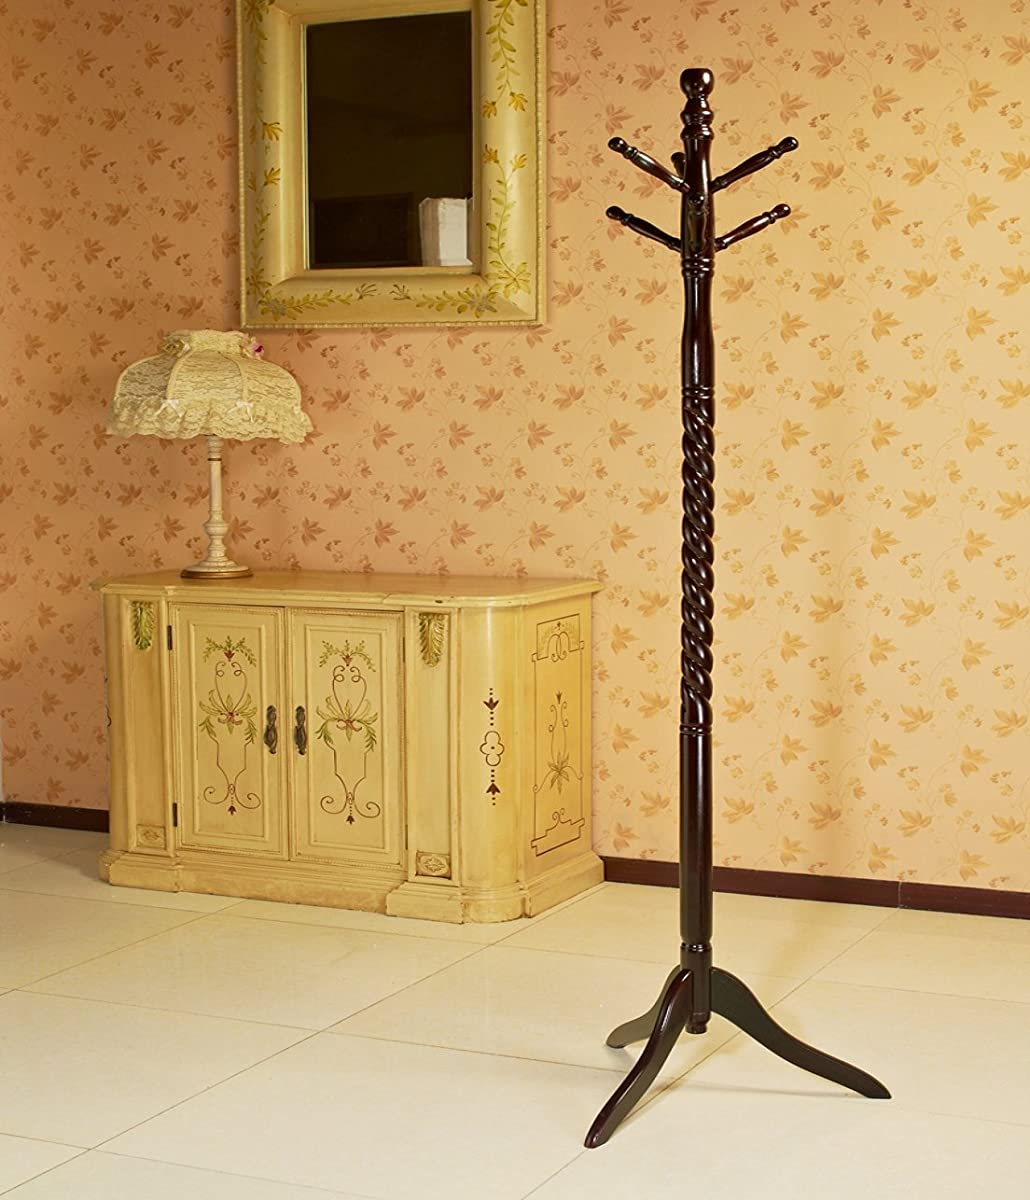 Frenchi Furniture Swivel Coat Rack Stand in Cherry Finish